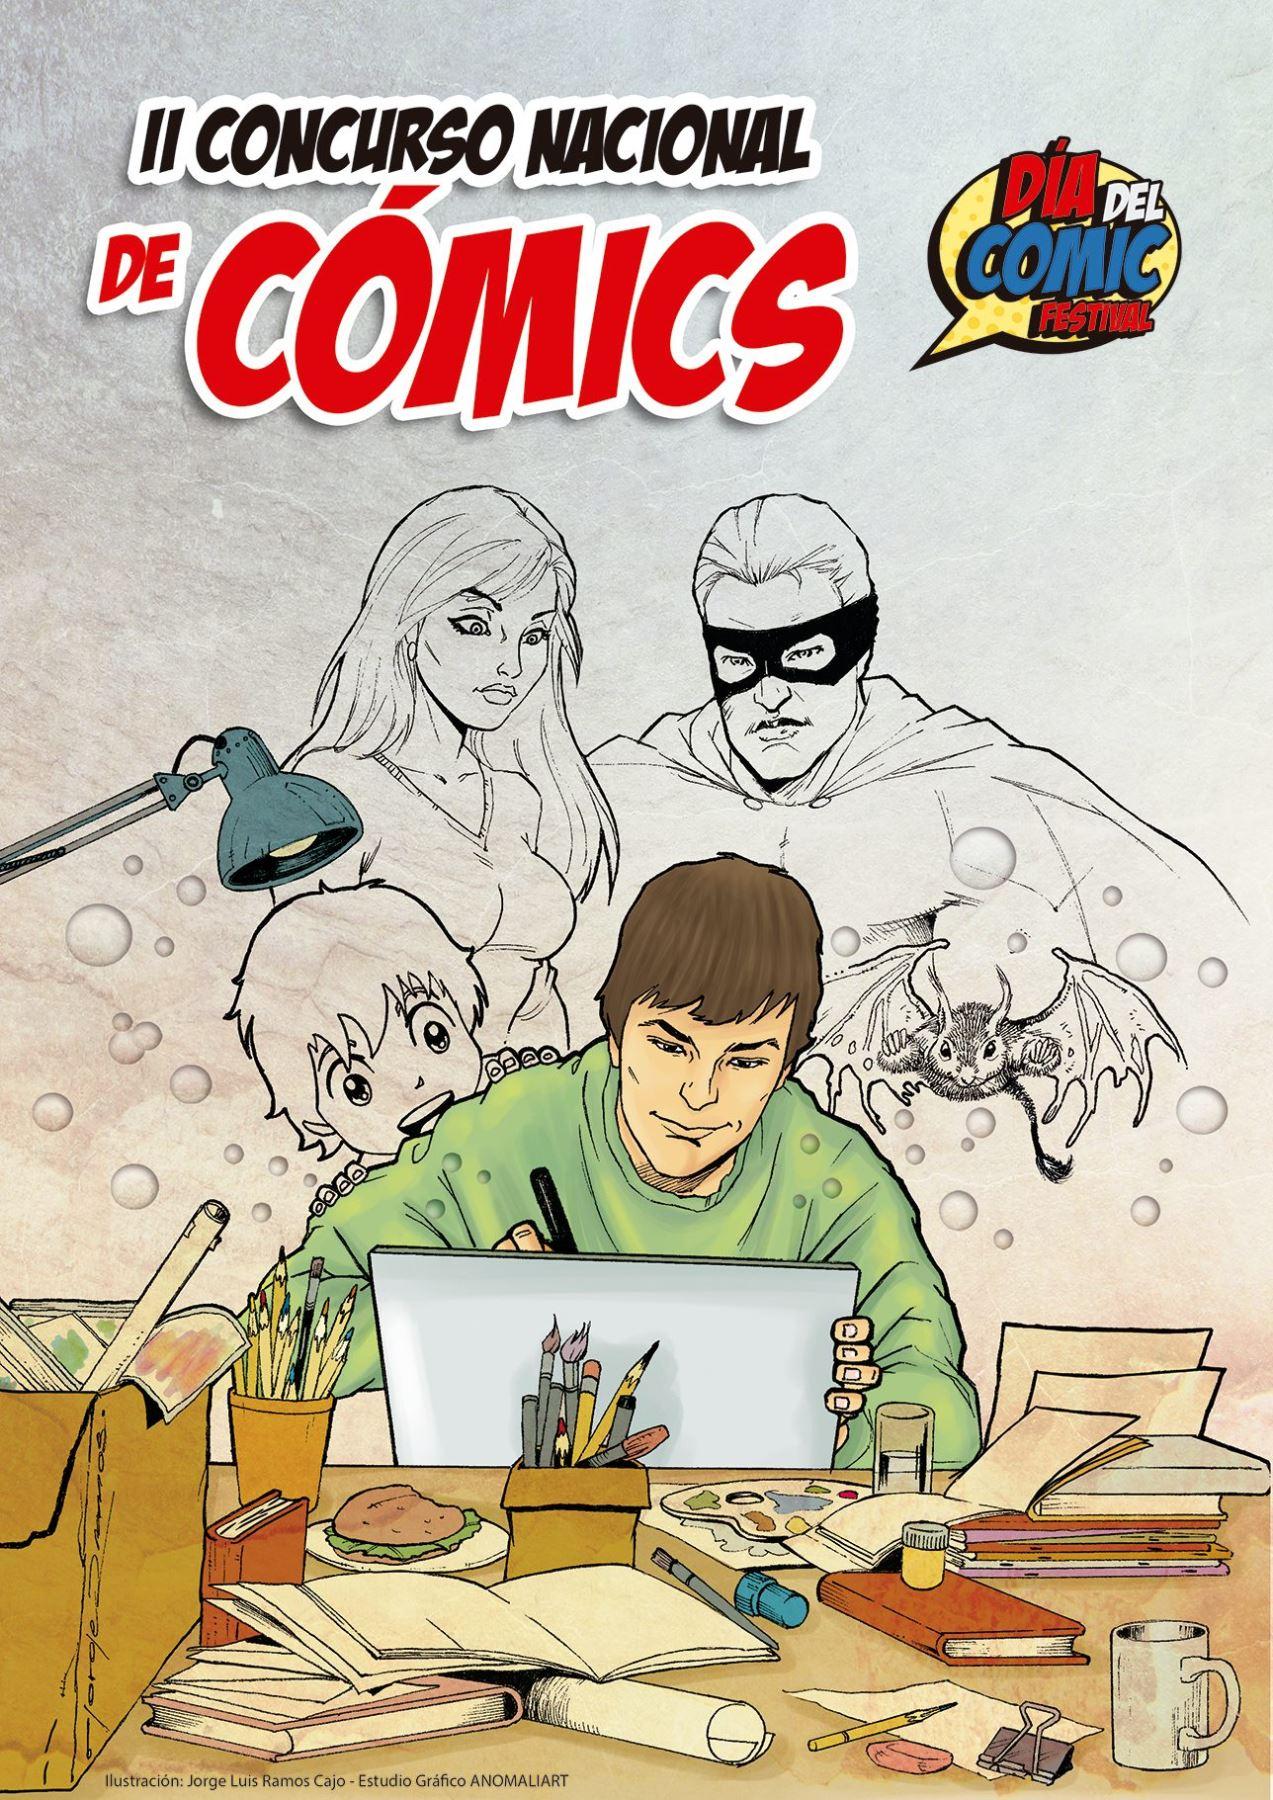 Se anuncia el II Concurso Nacional de Cómics.